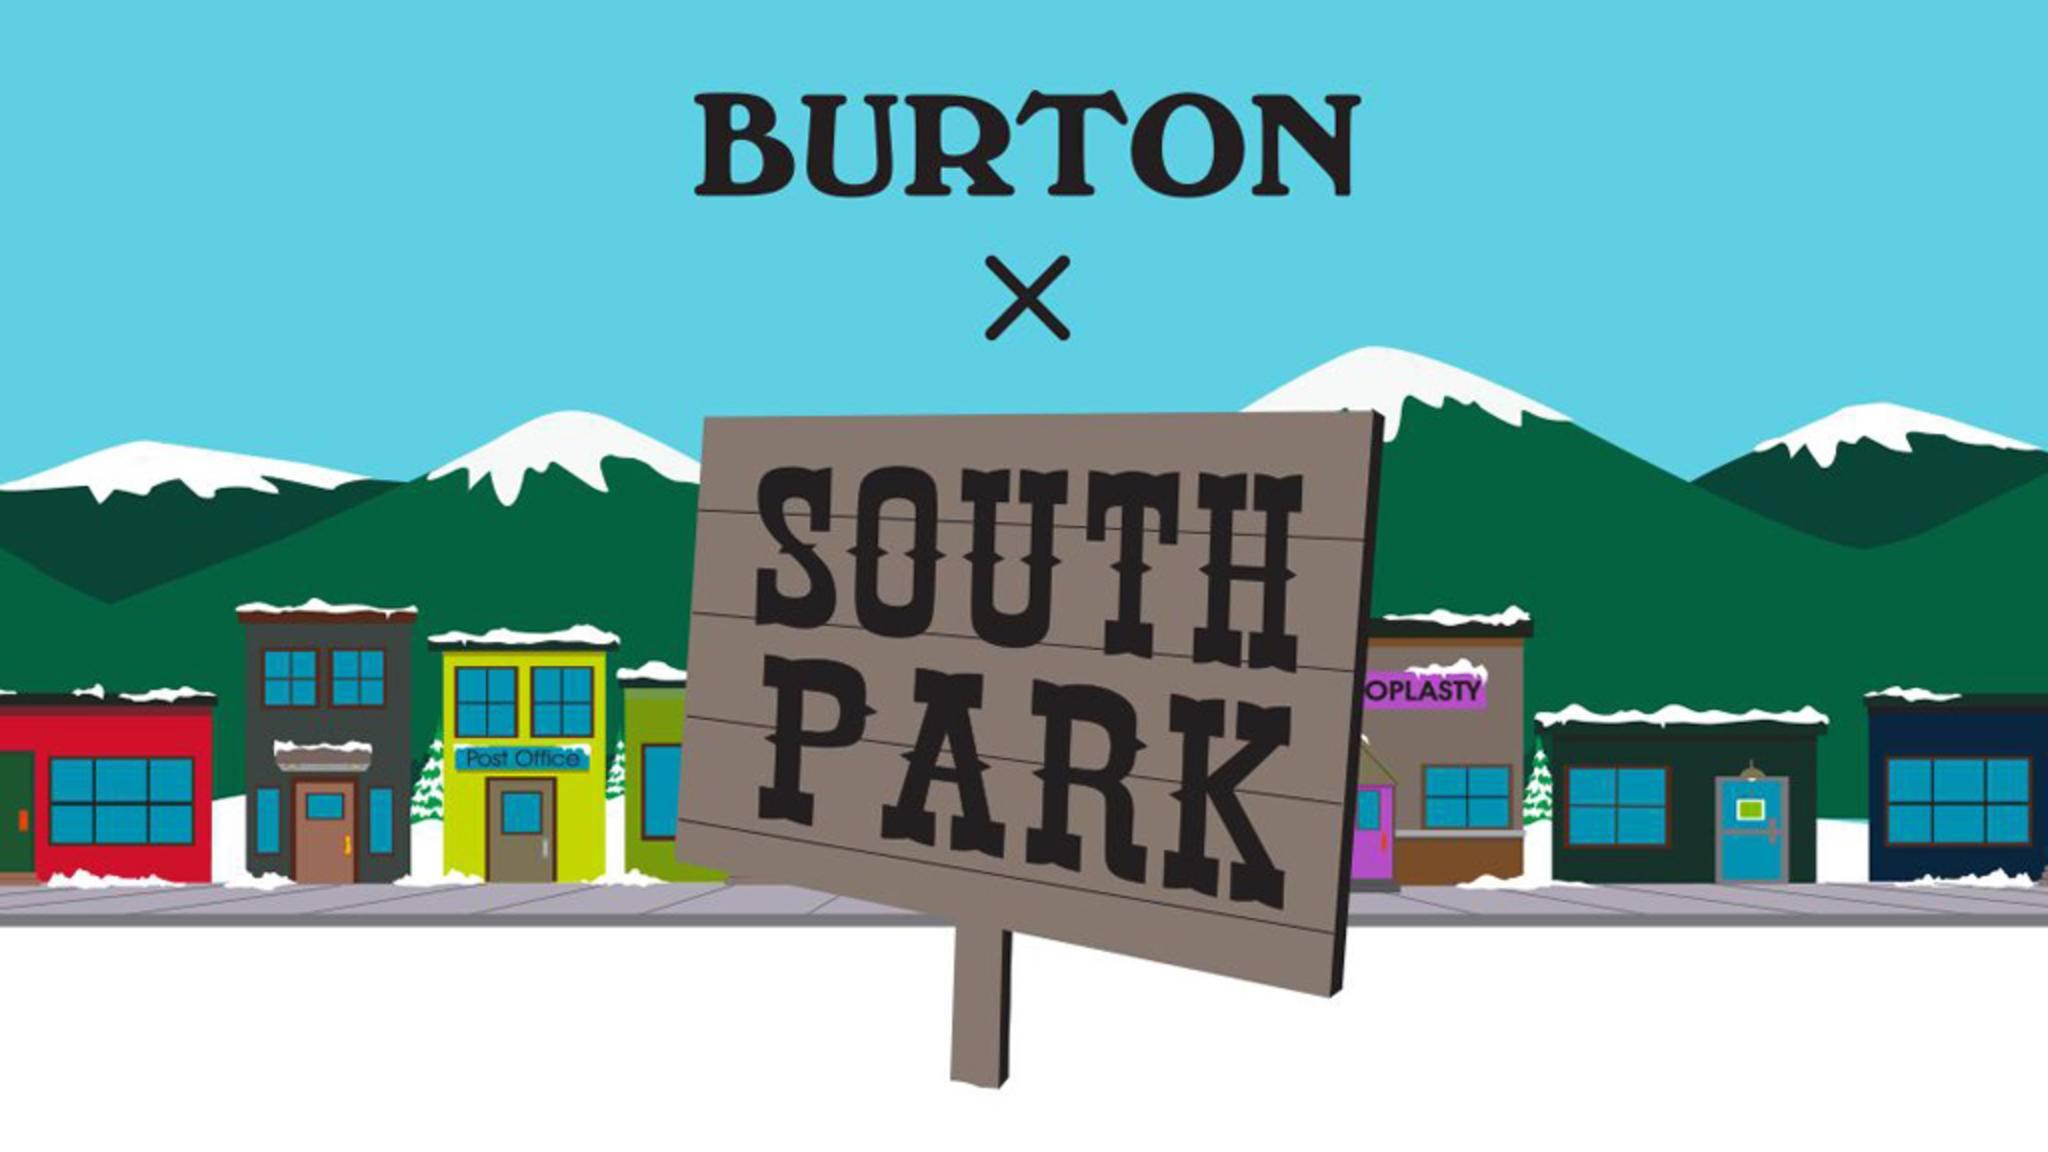 Snowboard Burton South Park